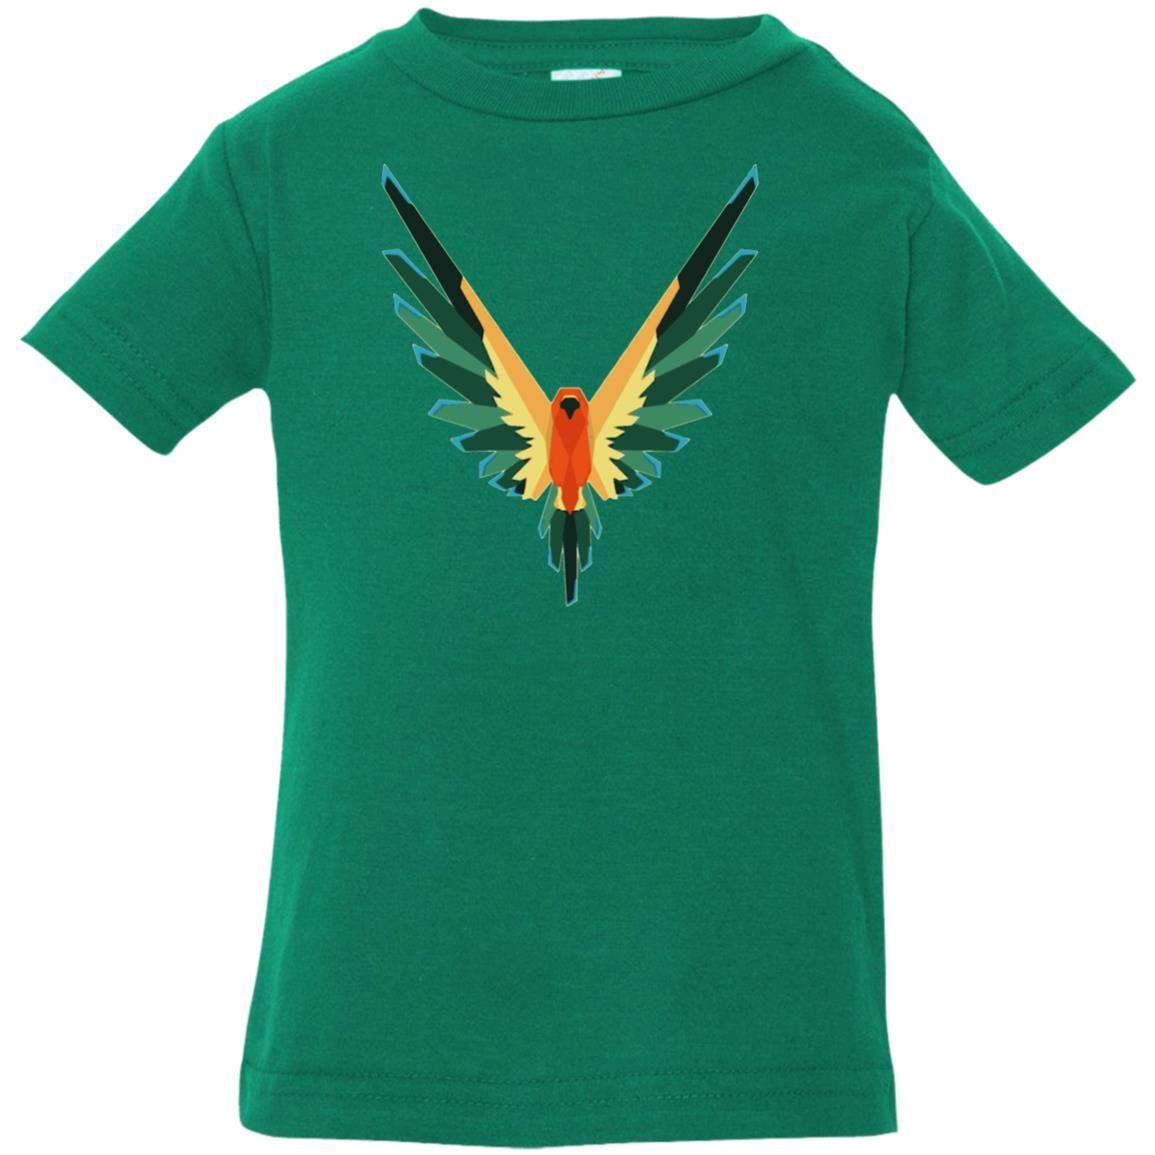 image 1239 - Logan Paul Maverick kid shirt & sweatshirt